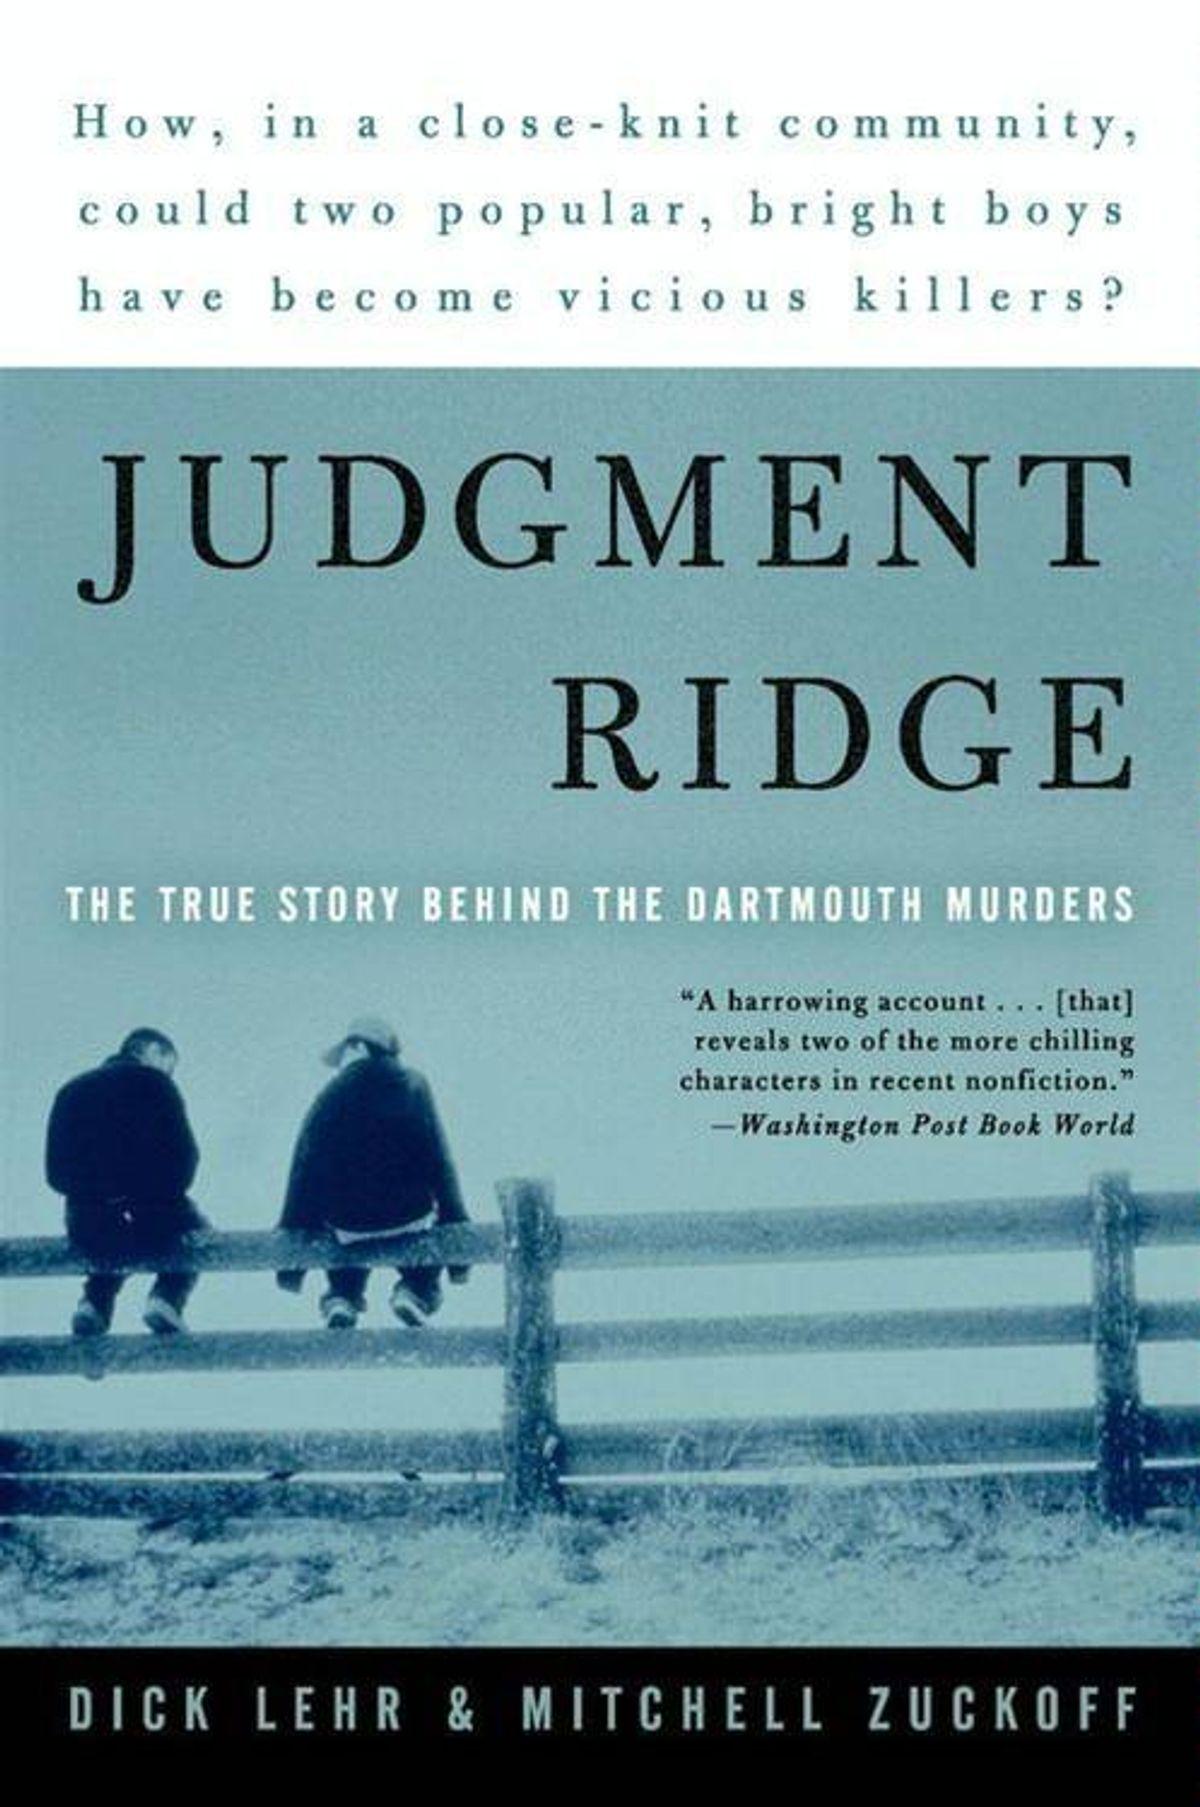 judgment-ridge.jpg